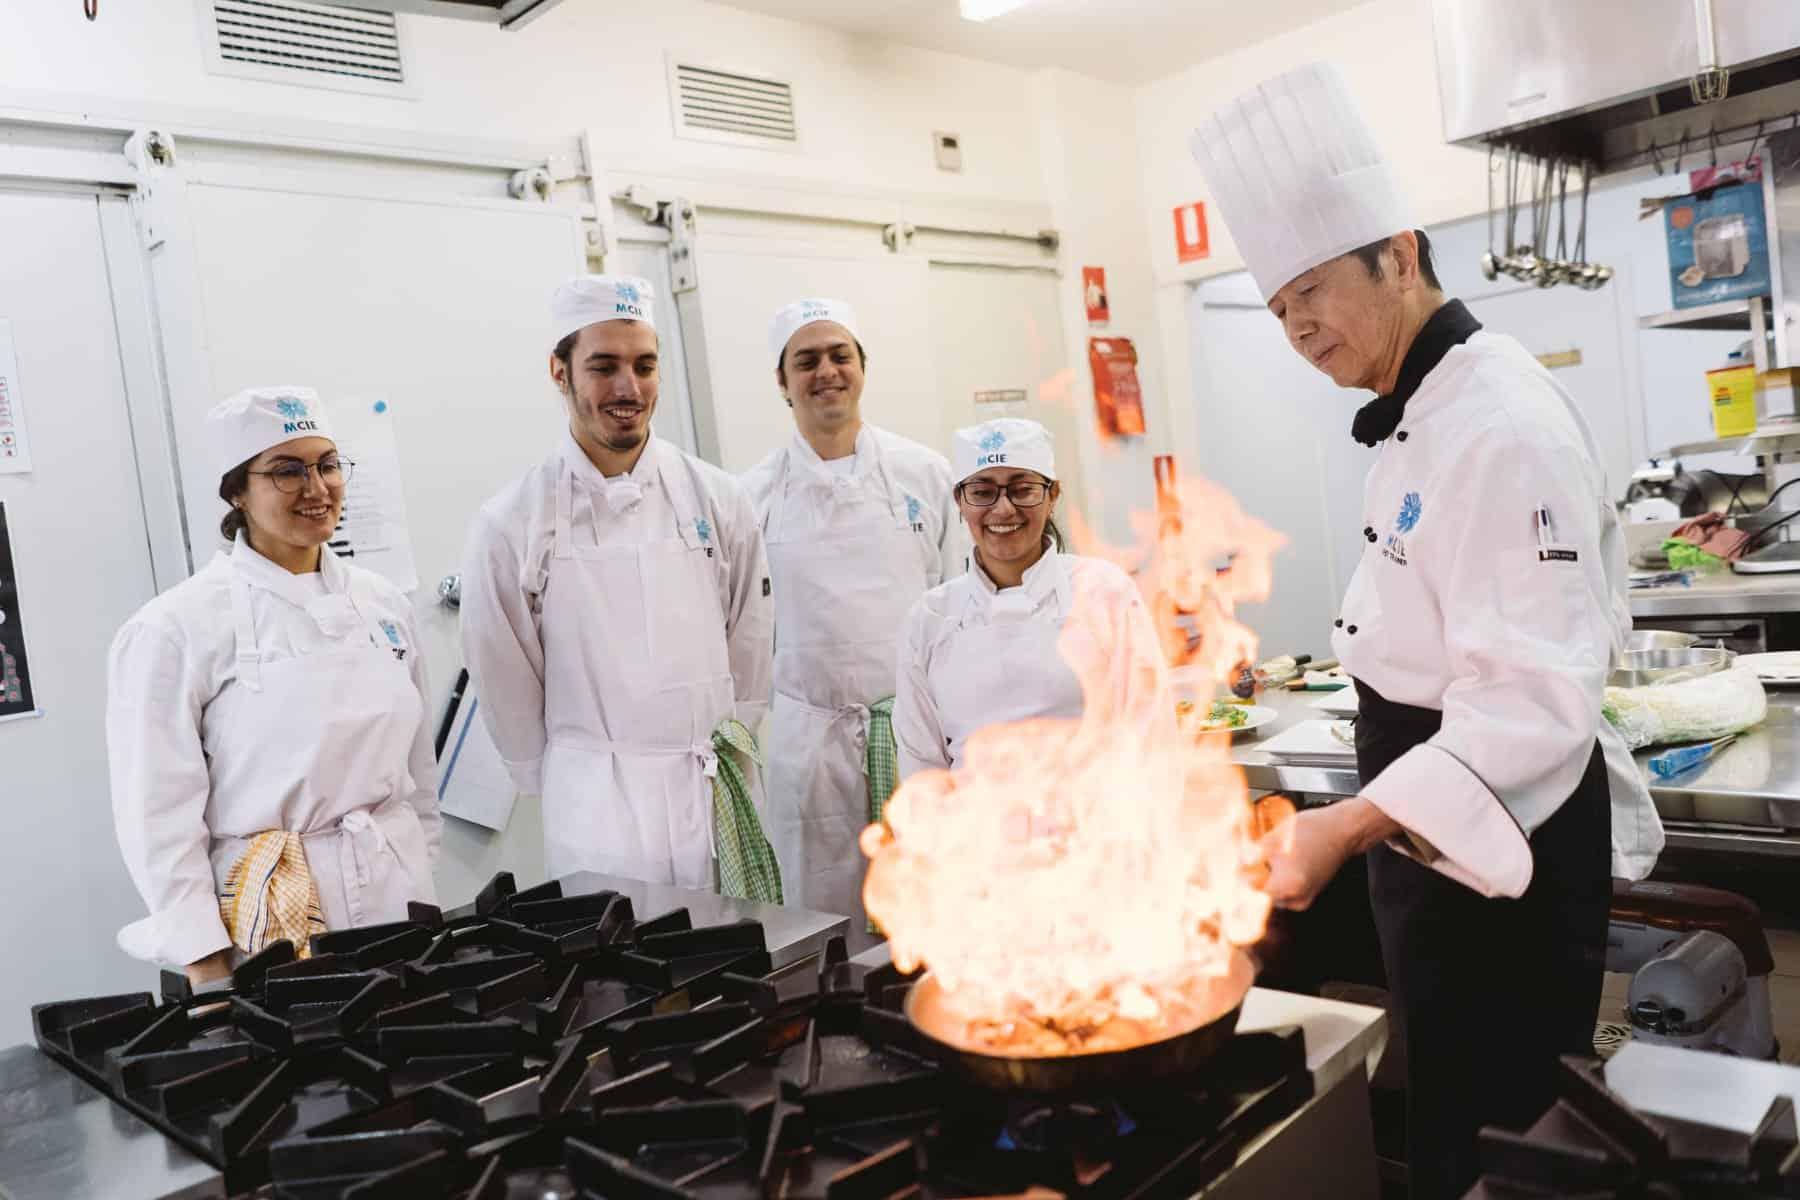 In demand jobs in Australia: Employers struggling to fill vacancies